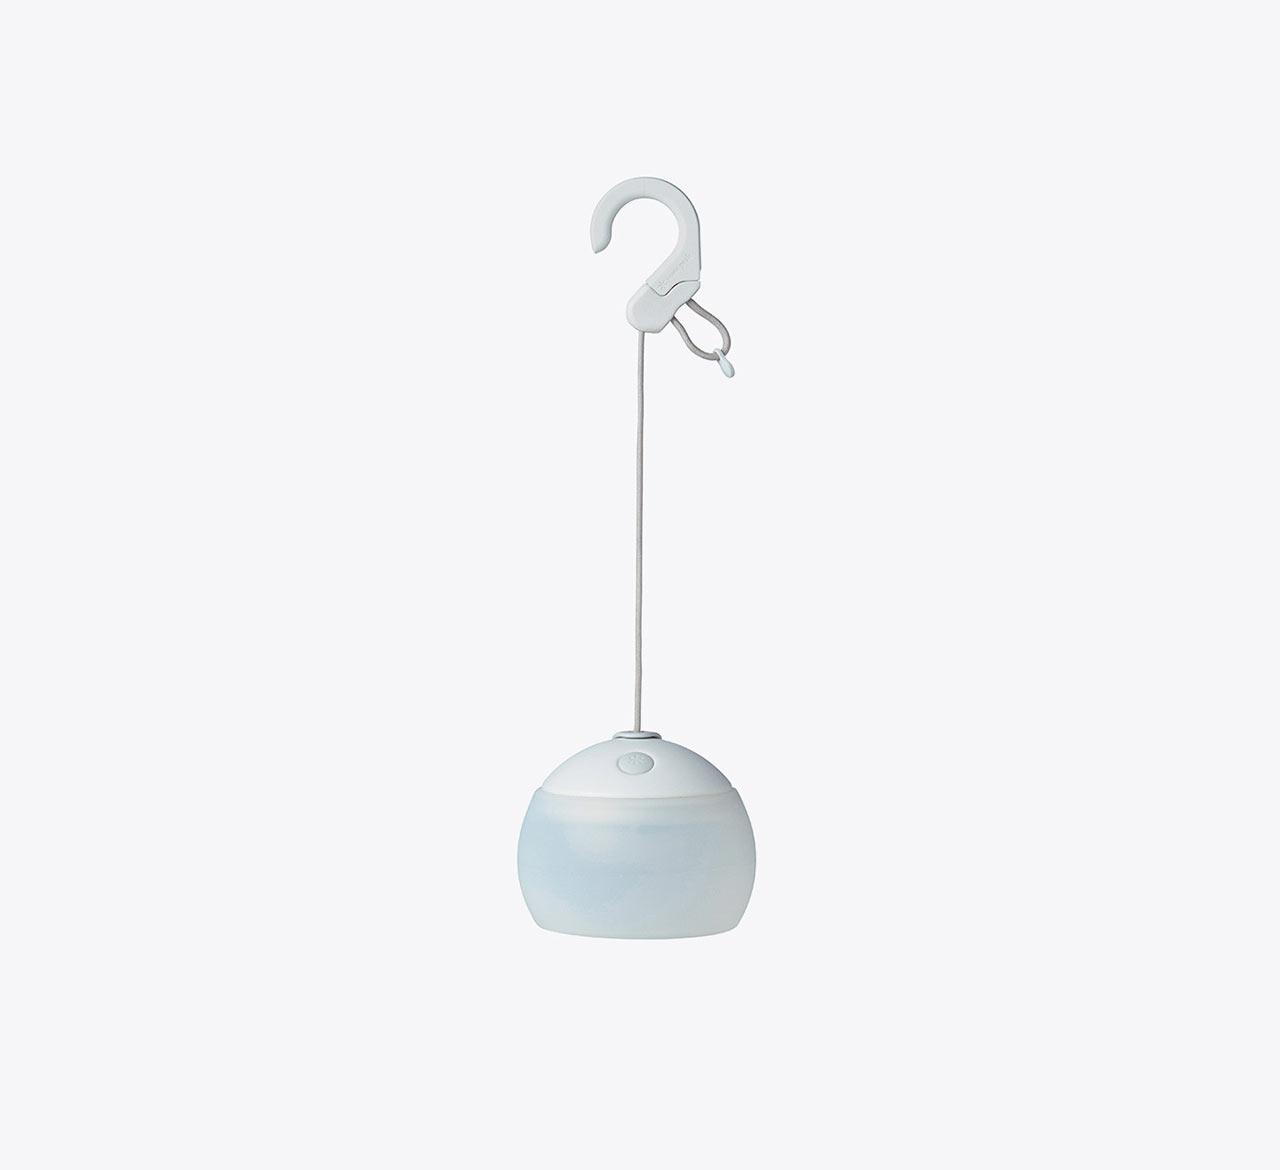 "Snow Peak Hozuki Lantern 2.0 ""Listens"" to Conserve Power"